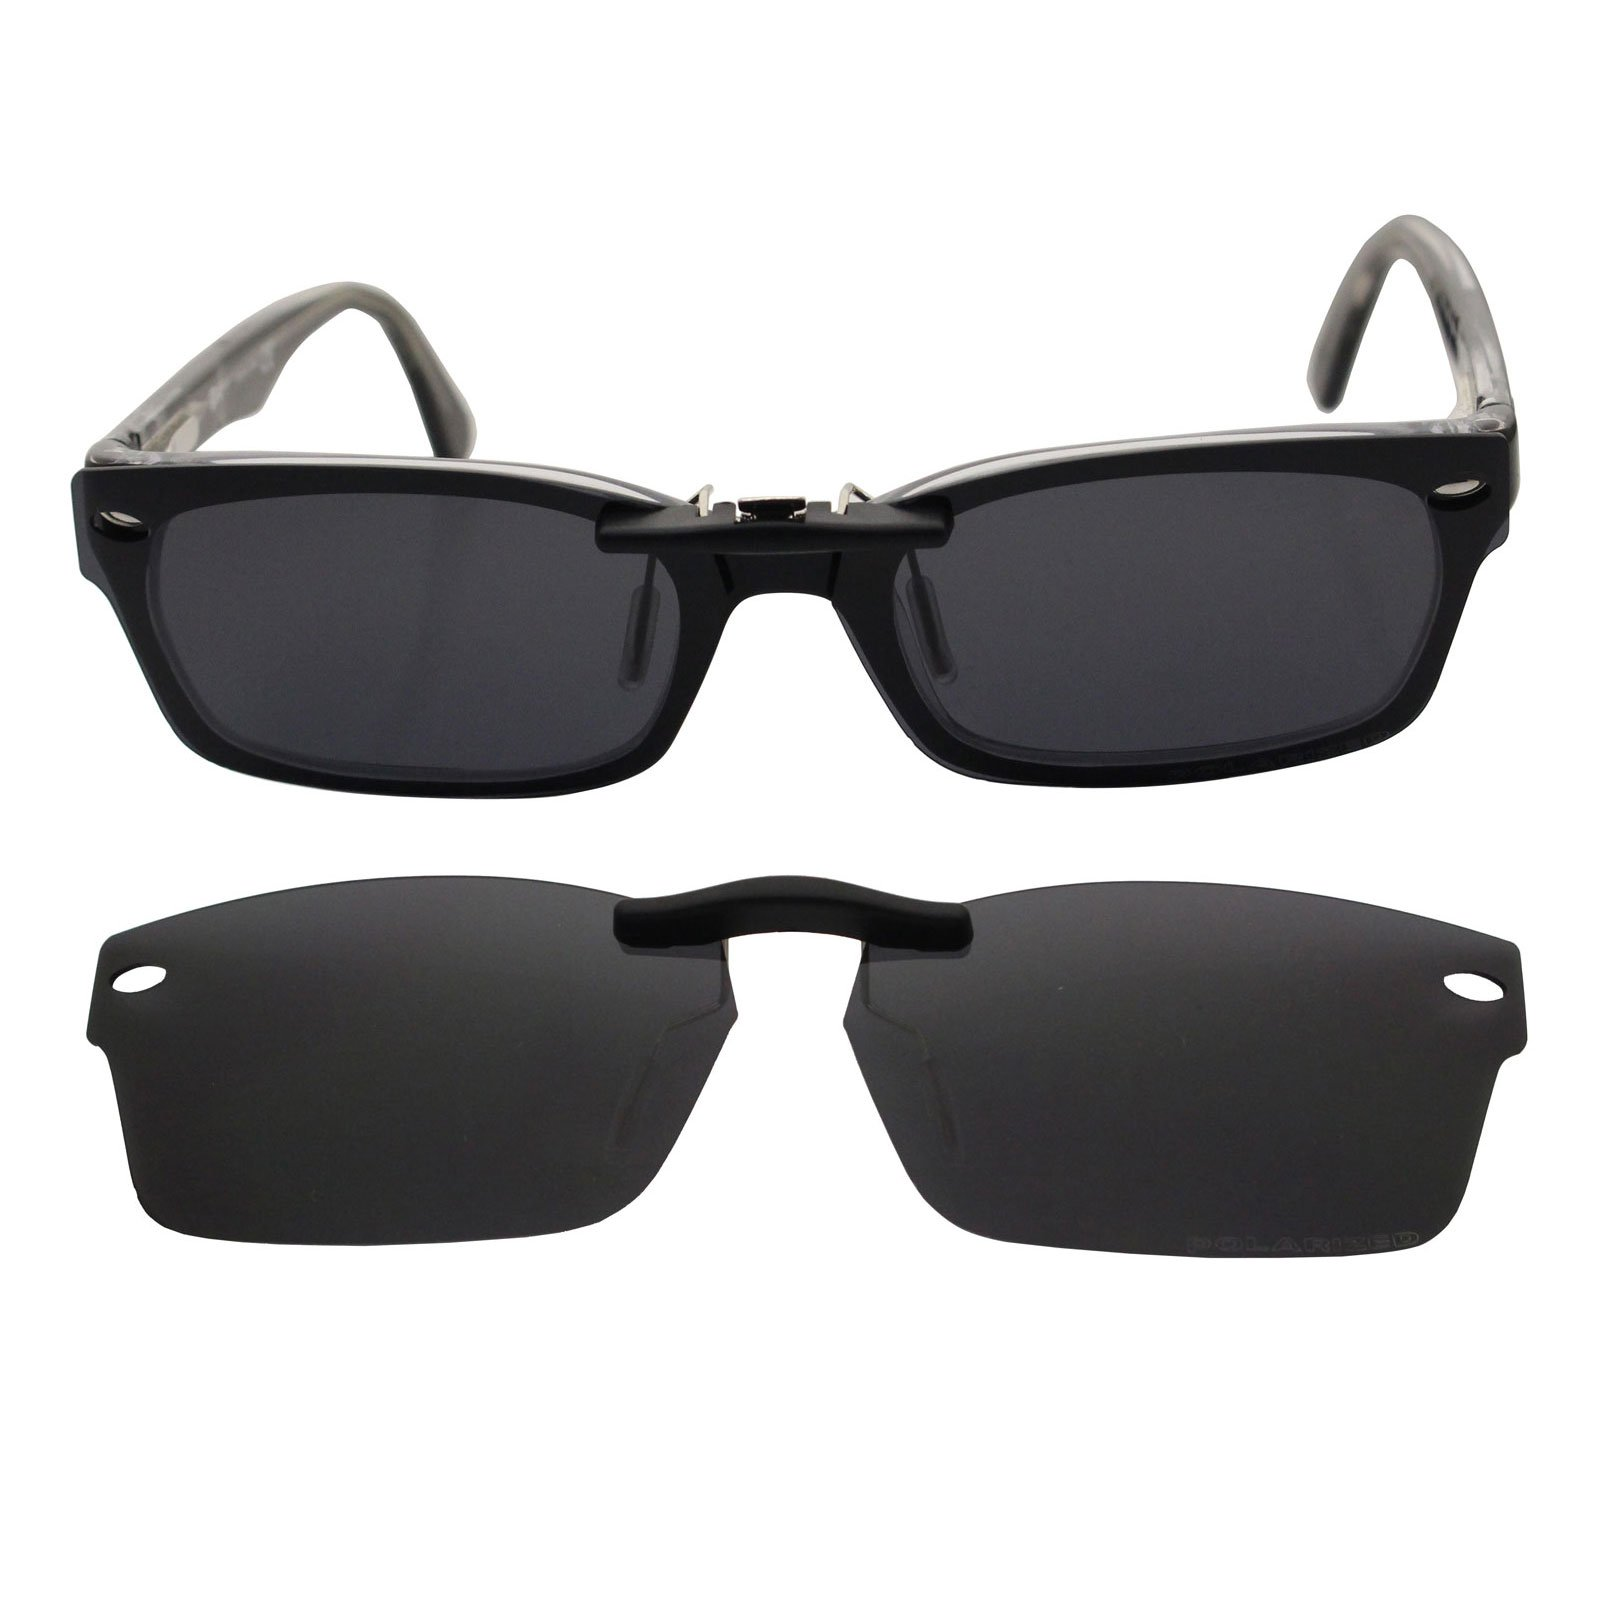 Custom Polarized Clip On Sunglasses for RAY-BAN RB5150 (52mm) 52-19-135 (Black)